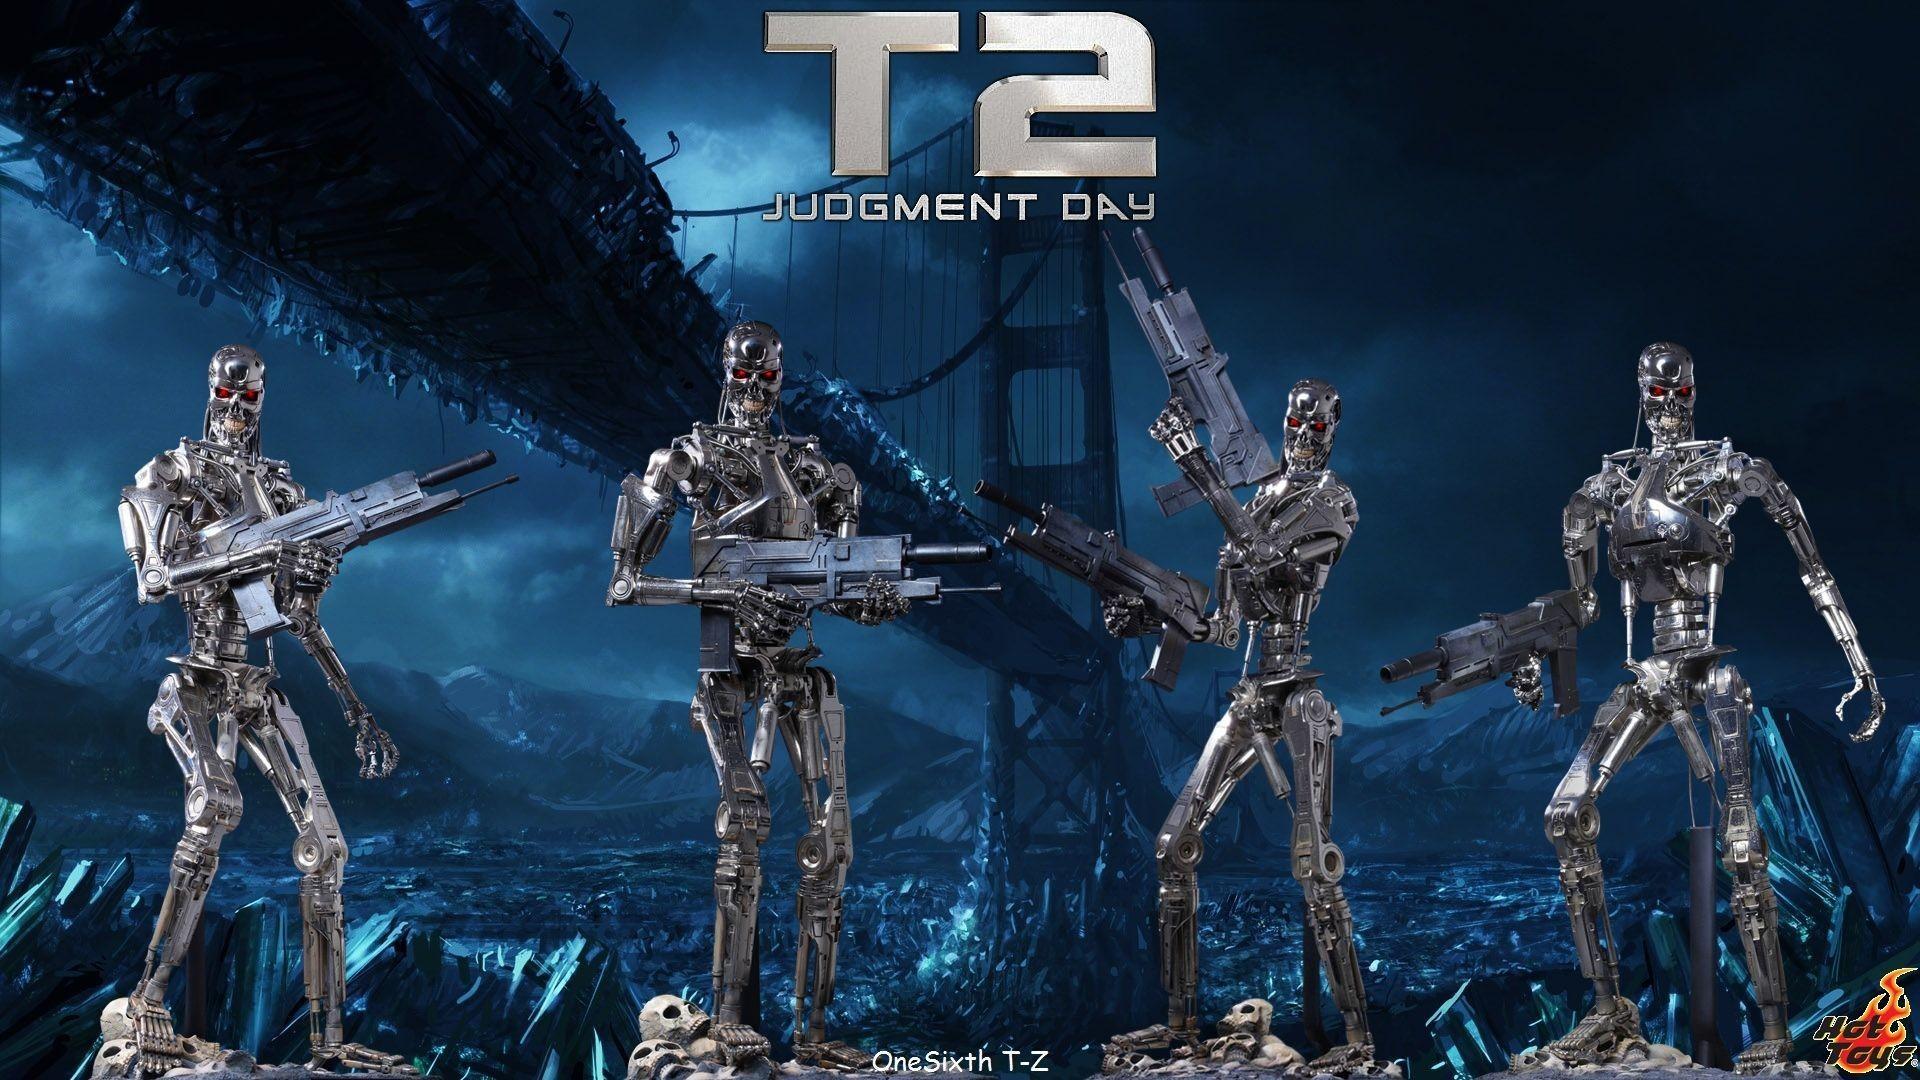 Res: 1920x1080, Terminator 2: Judgment Day Wallpaper 11 - 1920 X 1080